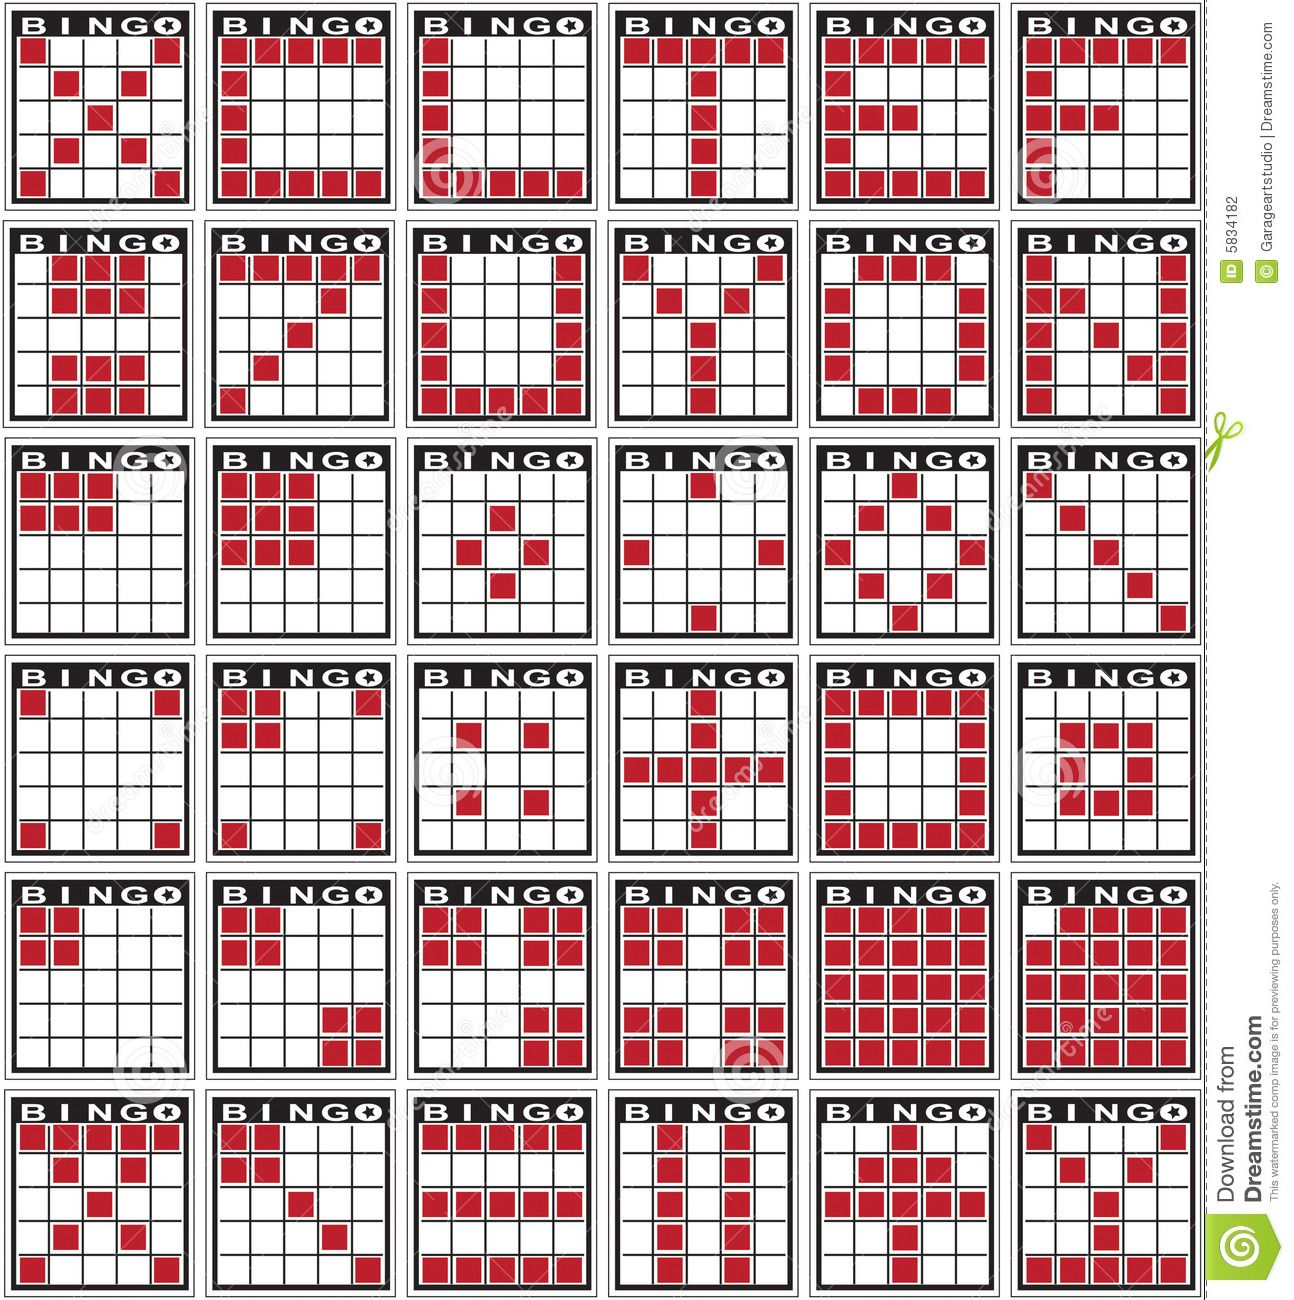 Bingo Patterns Stock Photography - Image: 5834182 | Bingo